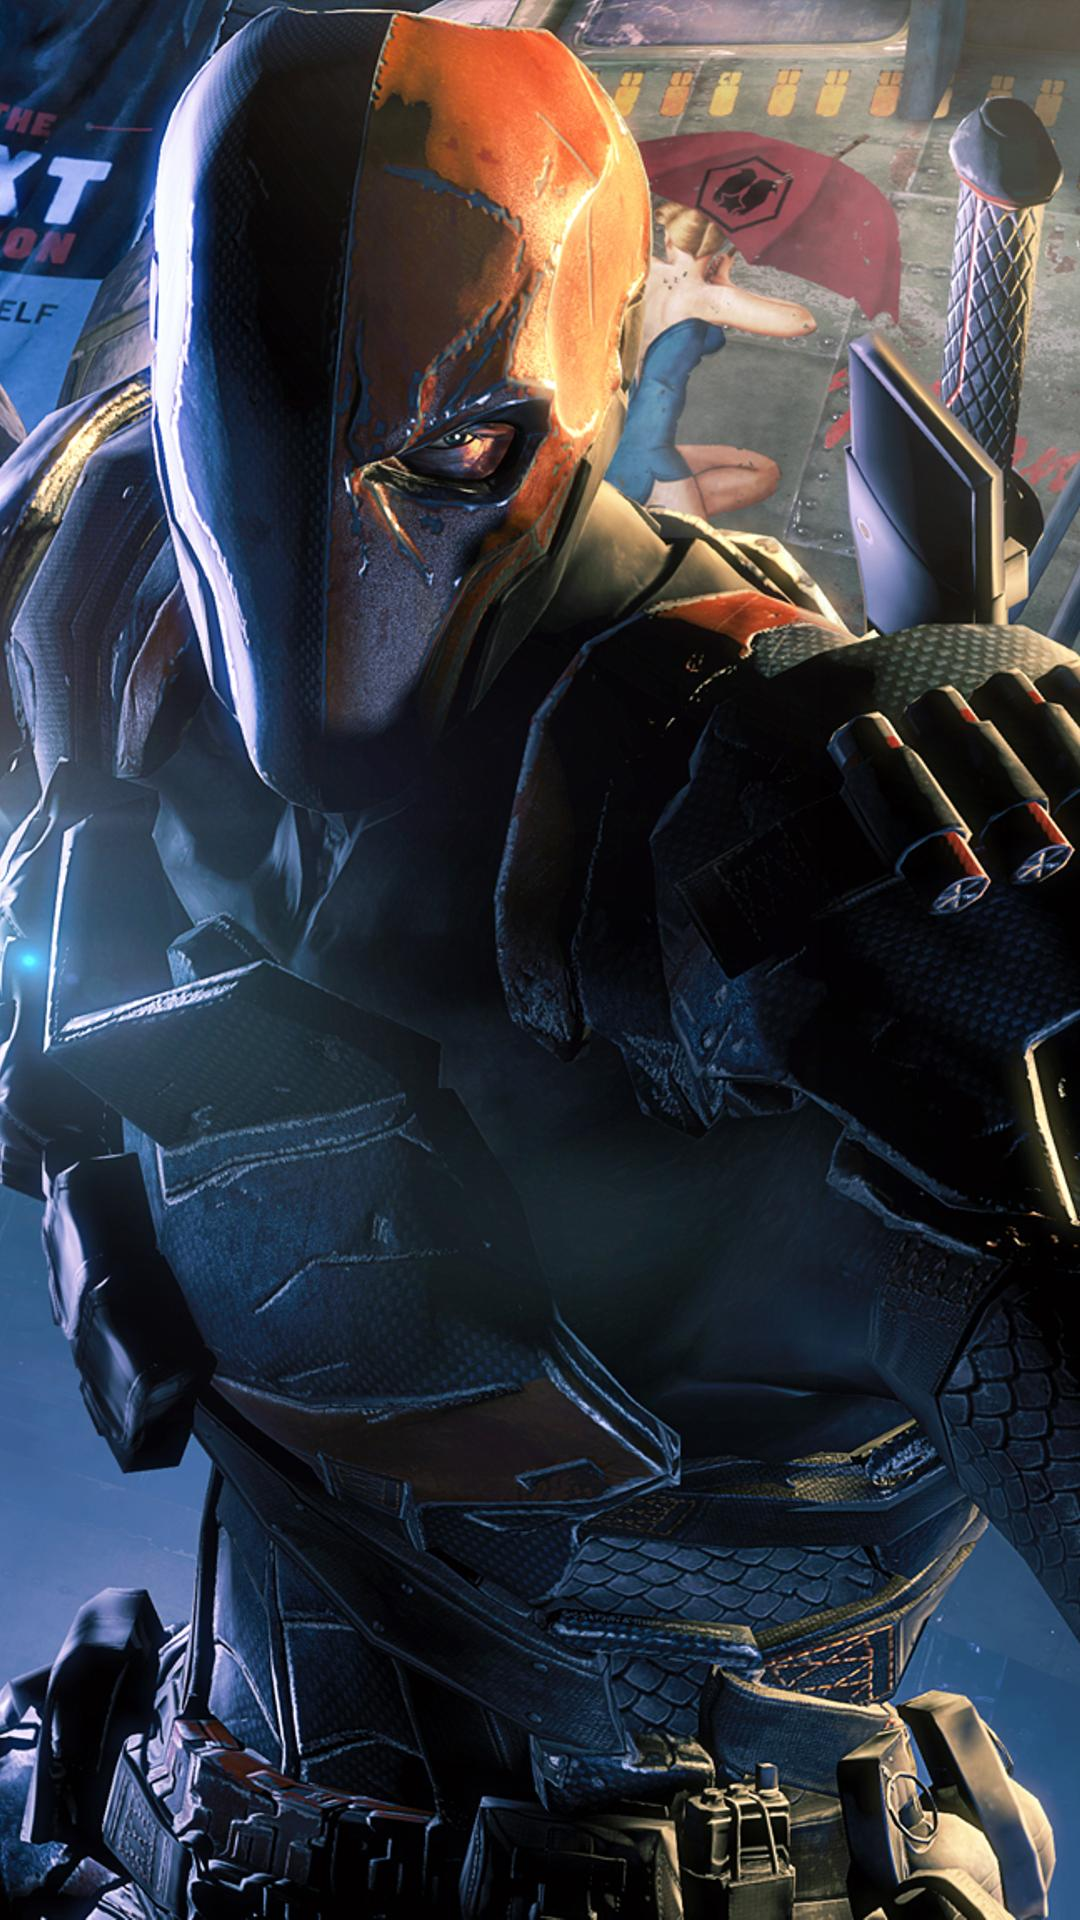 Batman Arkham Origins Deathstroke HD Wallpaper Download 1080x1920